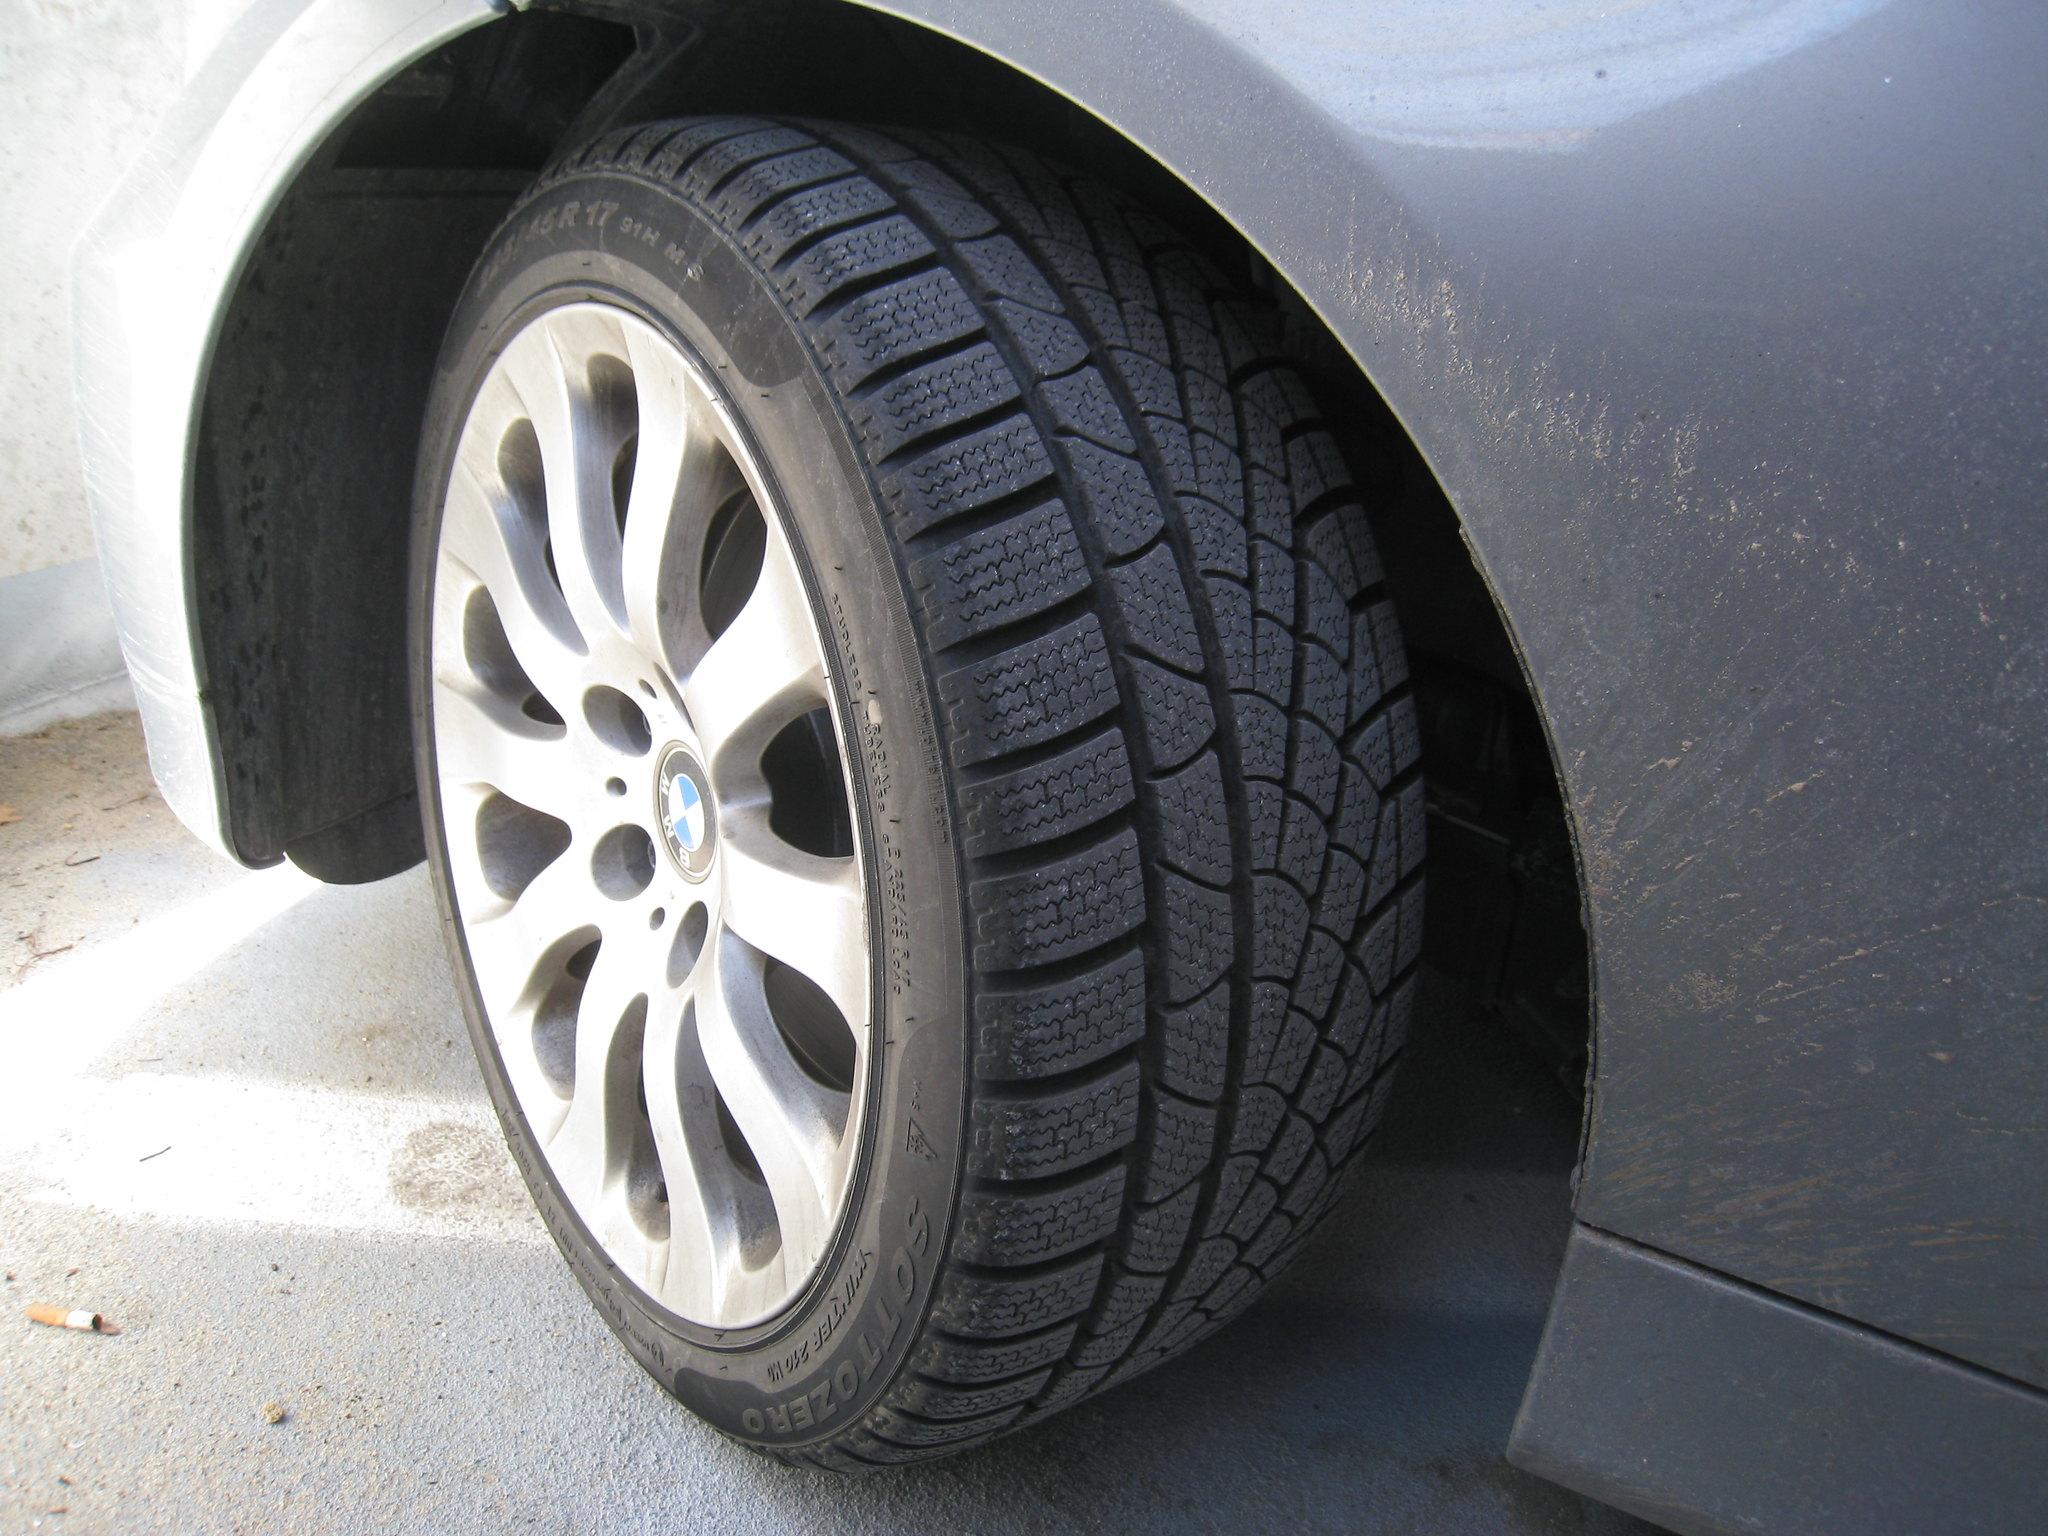 Neumáticos de invierno   Foto: Creativecommons.org